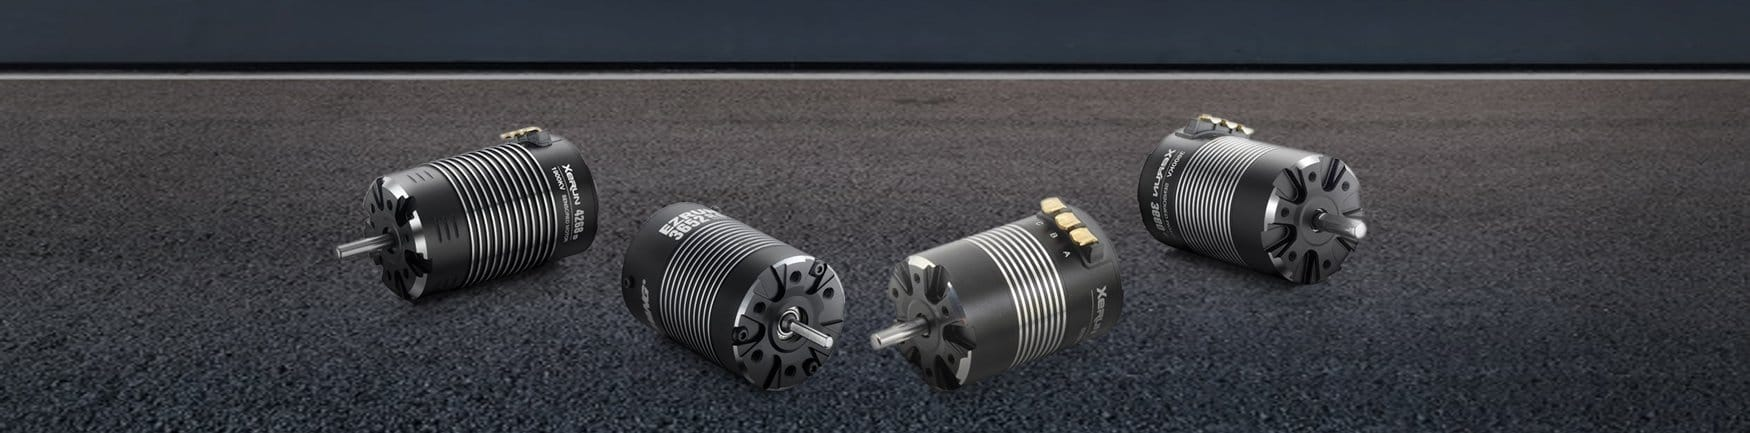 4 Pole Motors (New)